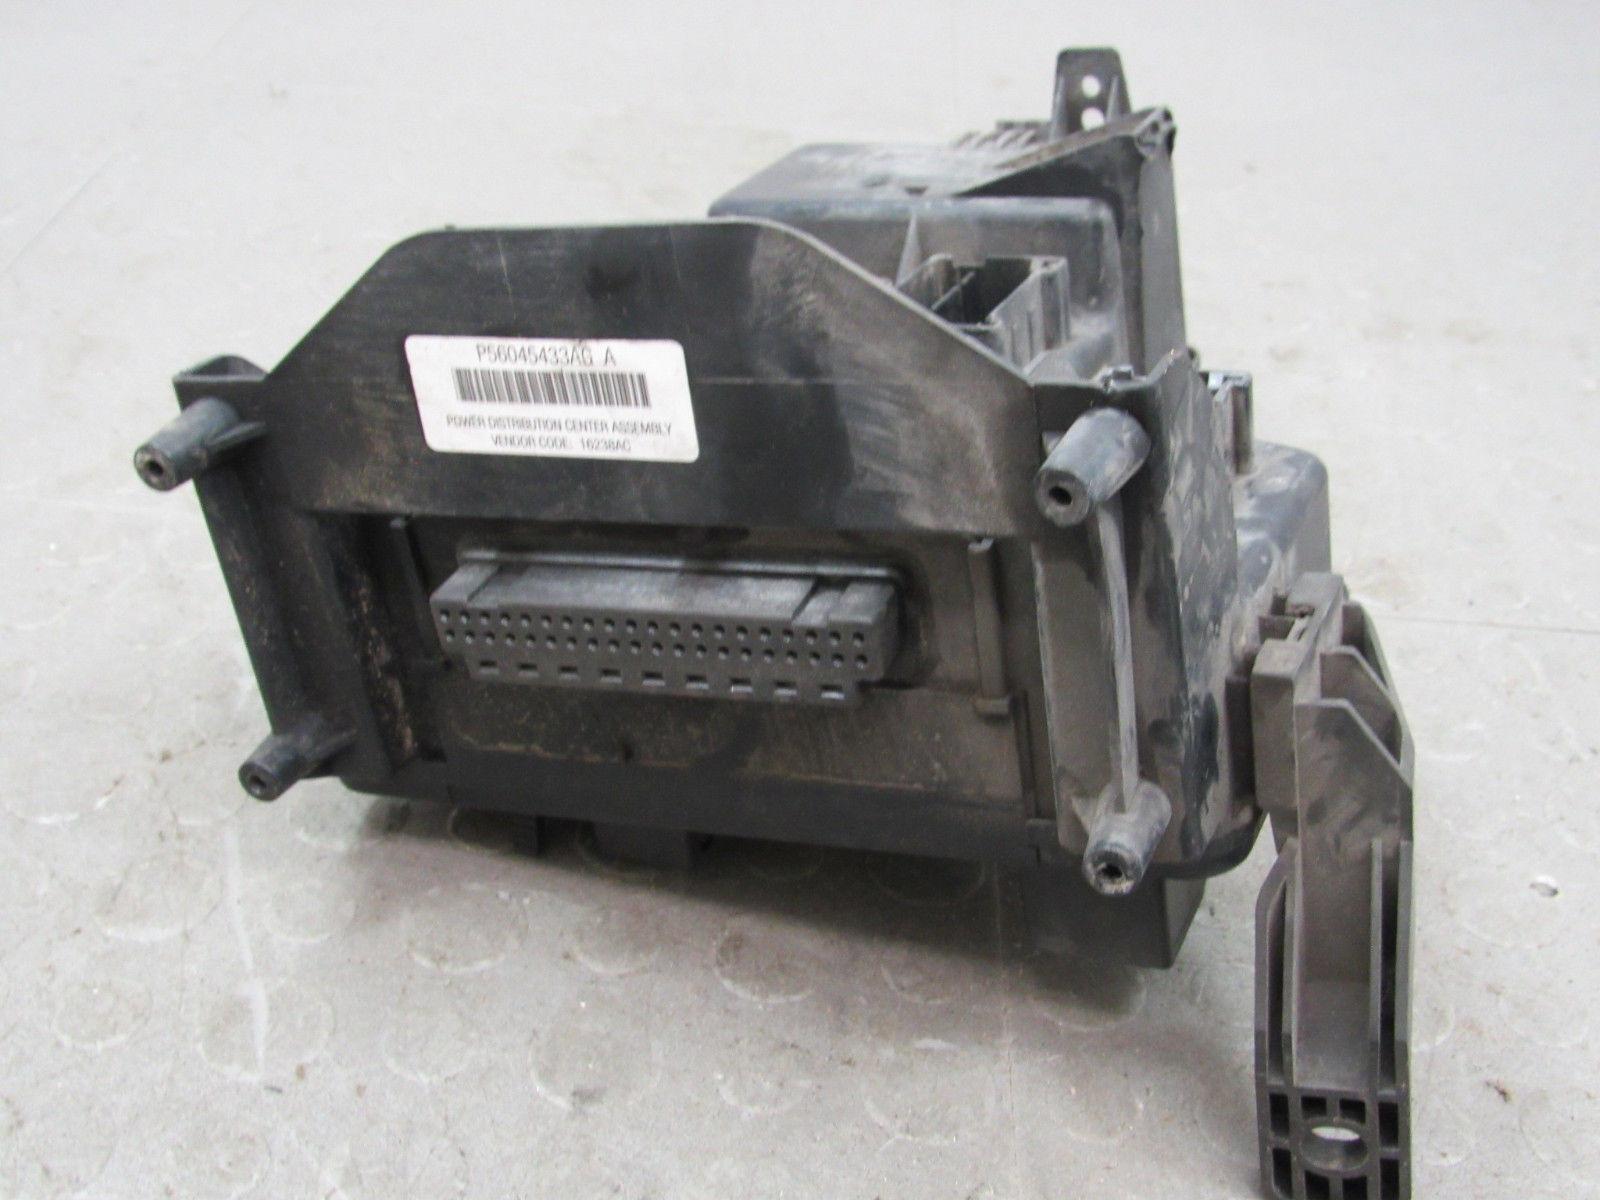 03 Dodge Truck Fuse Box Trusted Wiring Diagram 02 Ram Integrated Power Module Block Dakota Panel